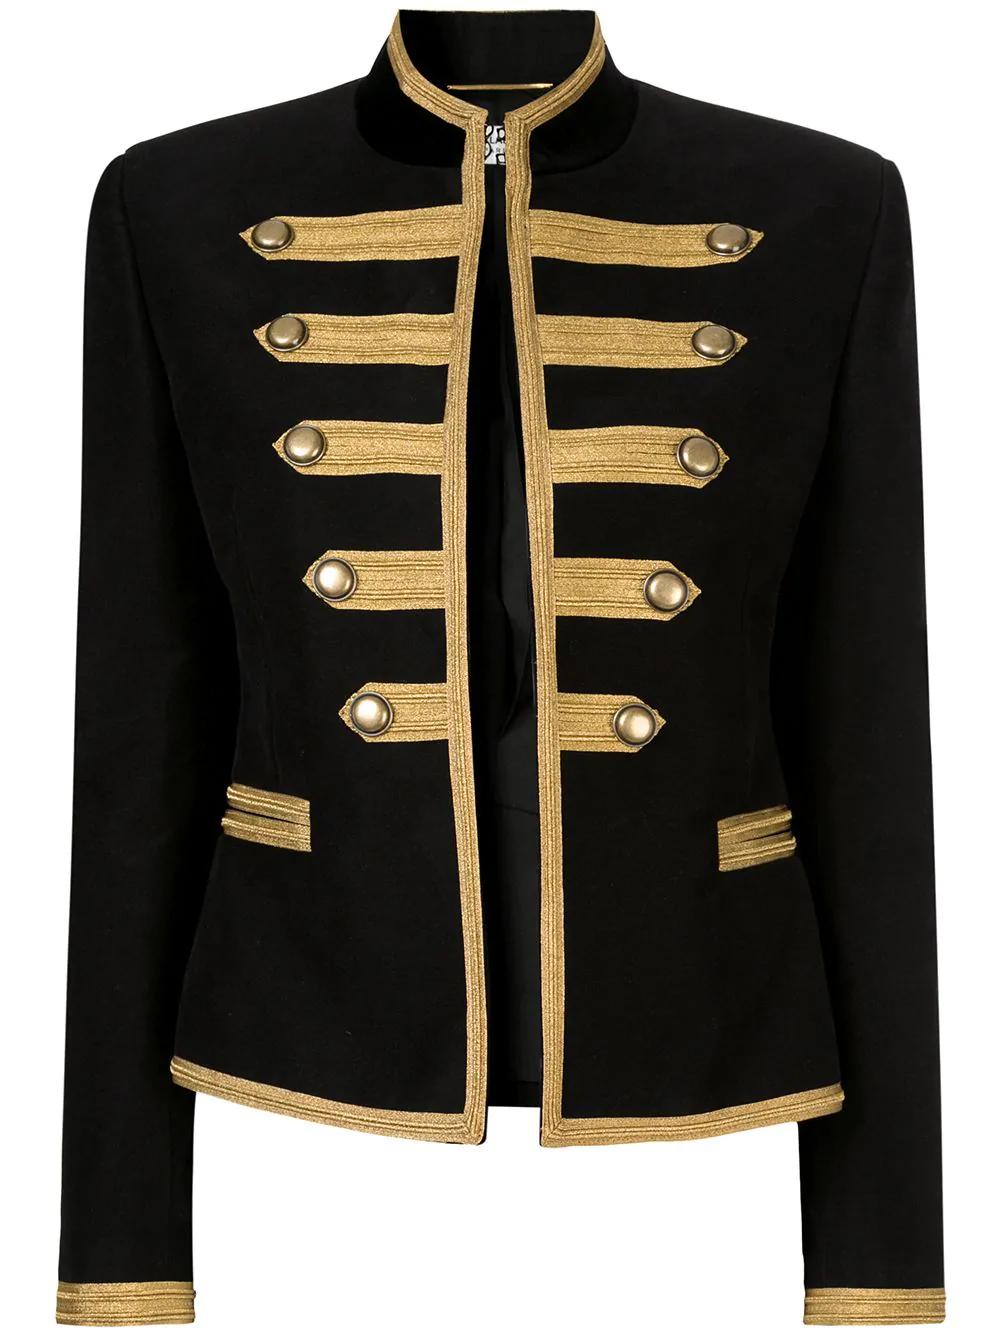 Saint Laurent Military Jacket Black Military Style Jacket Womens Military Jacket Women Military Jacket Outfits [ 1334 x 1000 Pixel ]